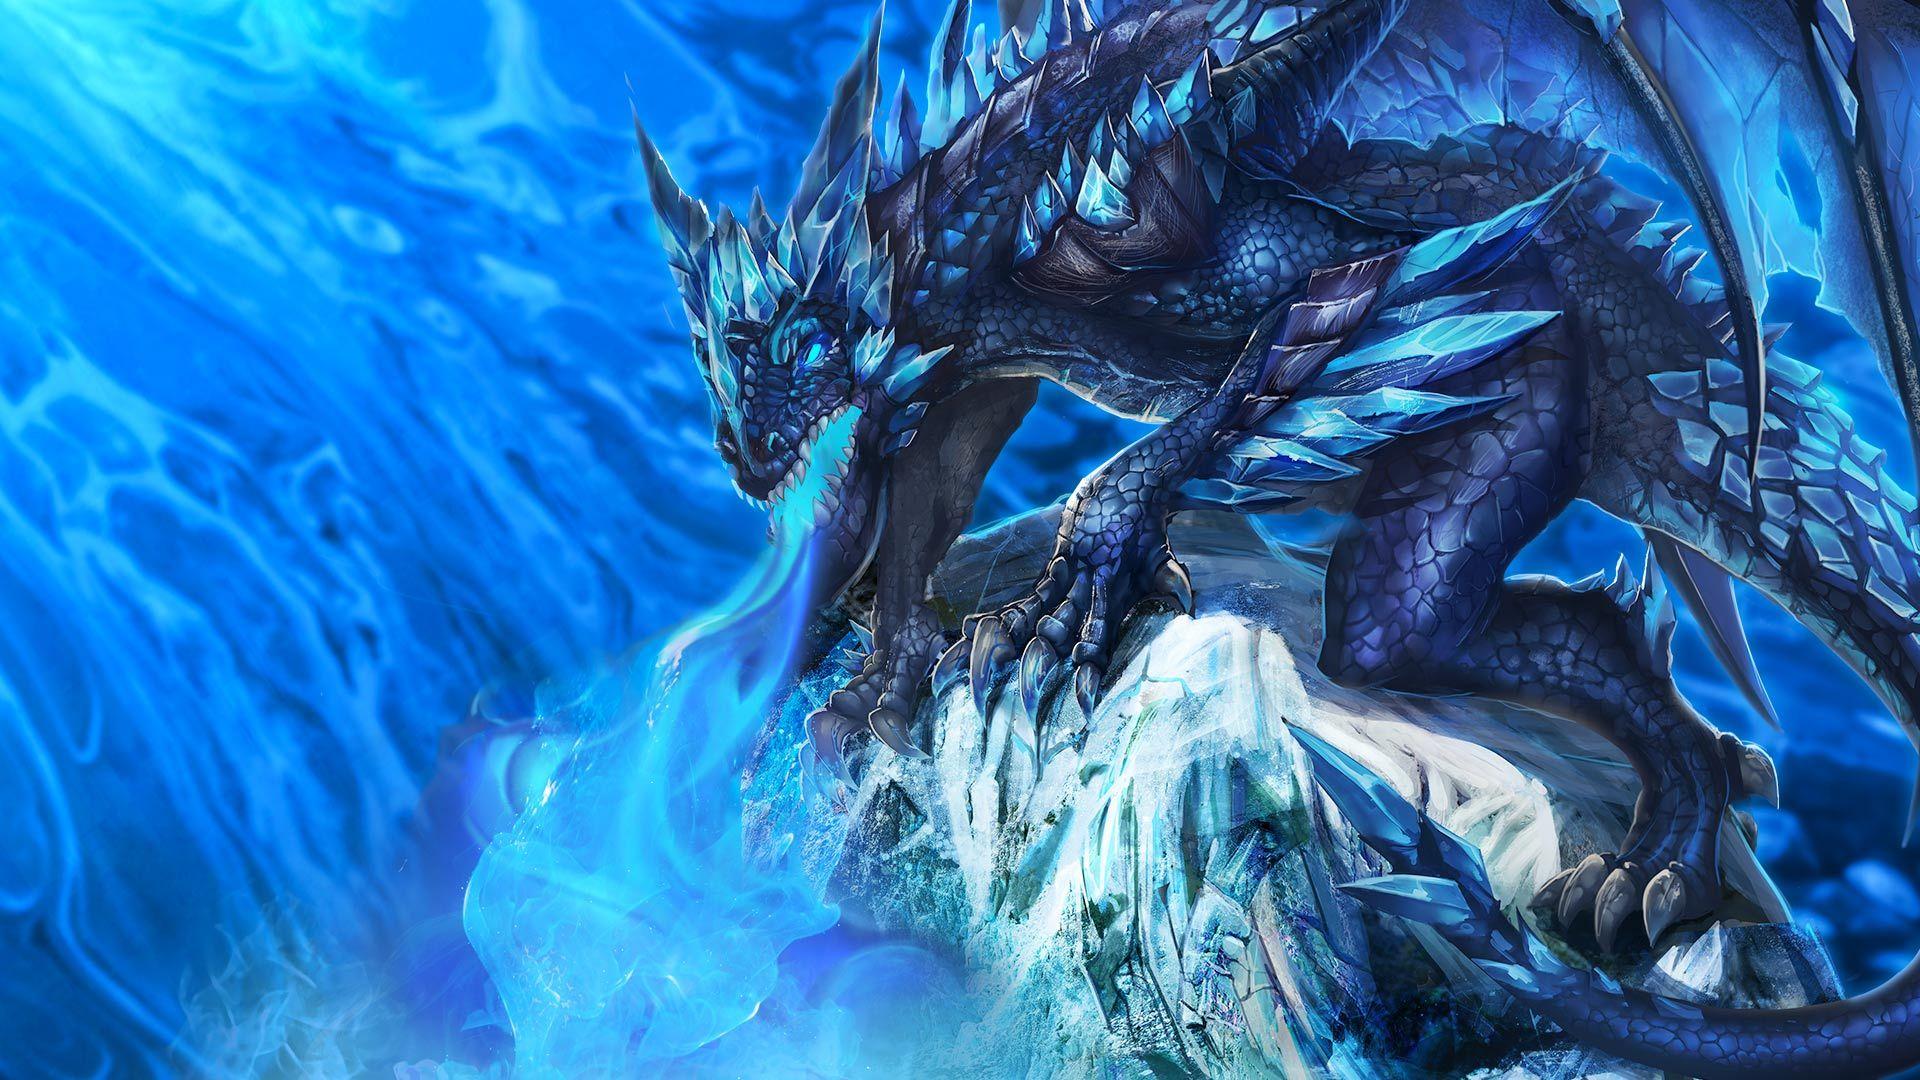 fantasy blue dragon wallpaper hd